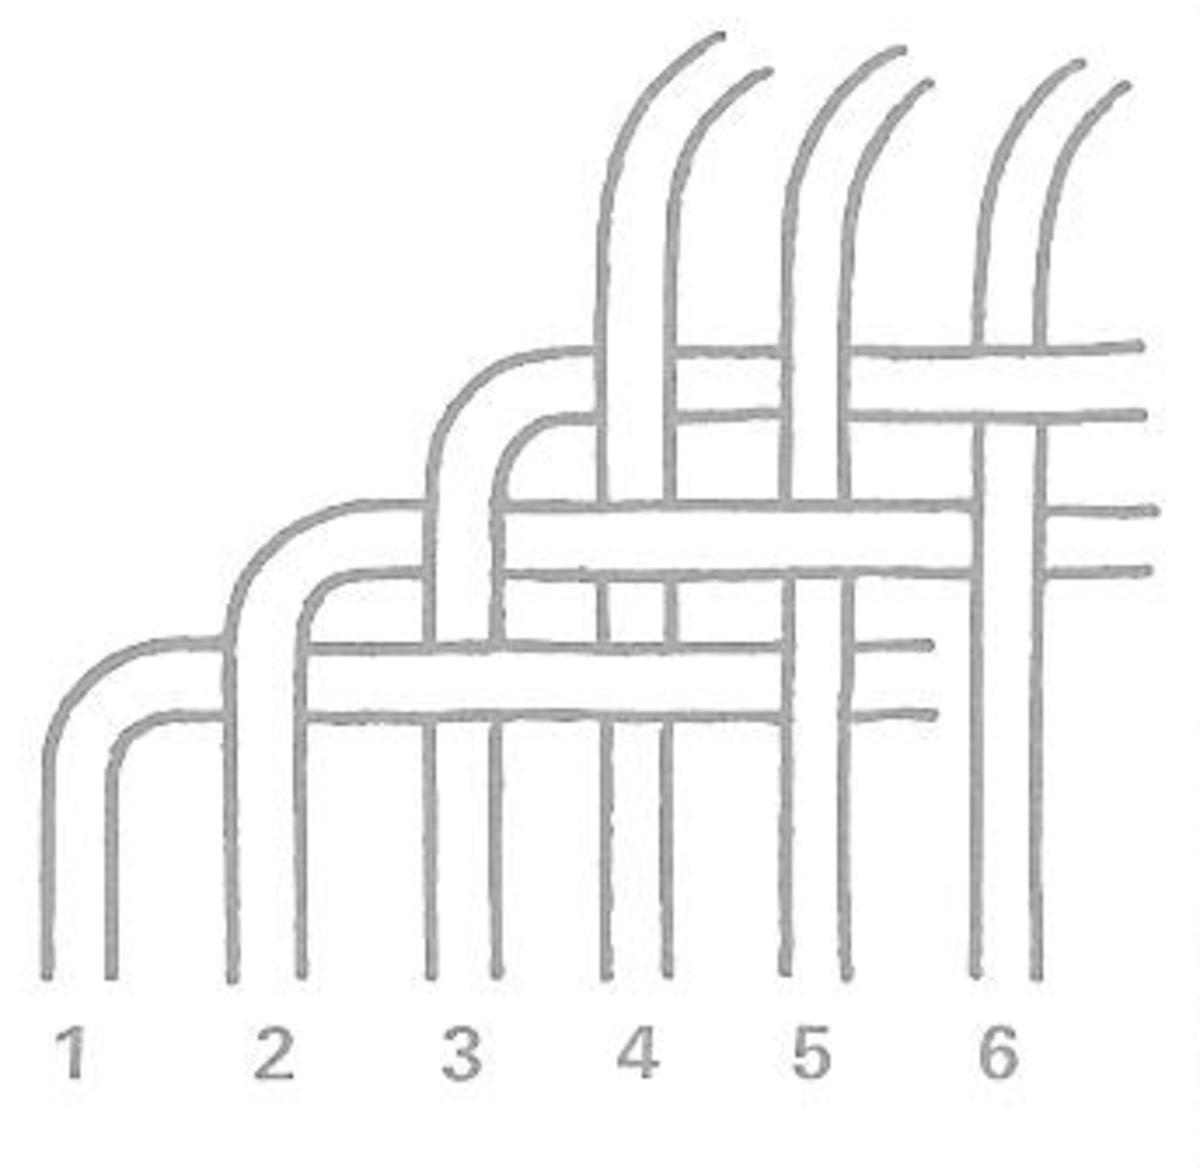 Figure 6: Braiding